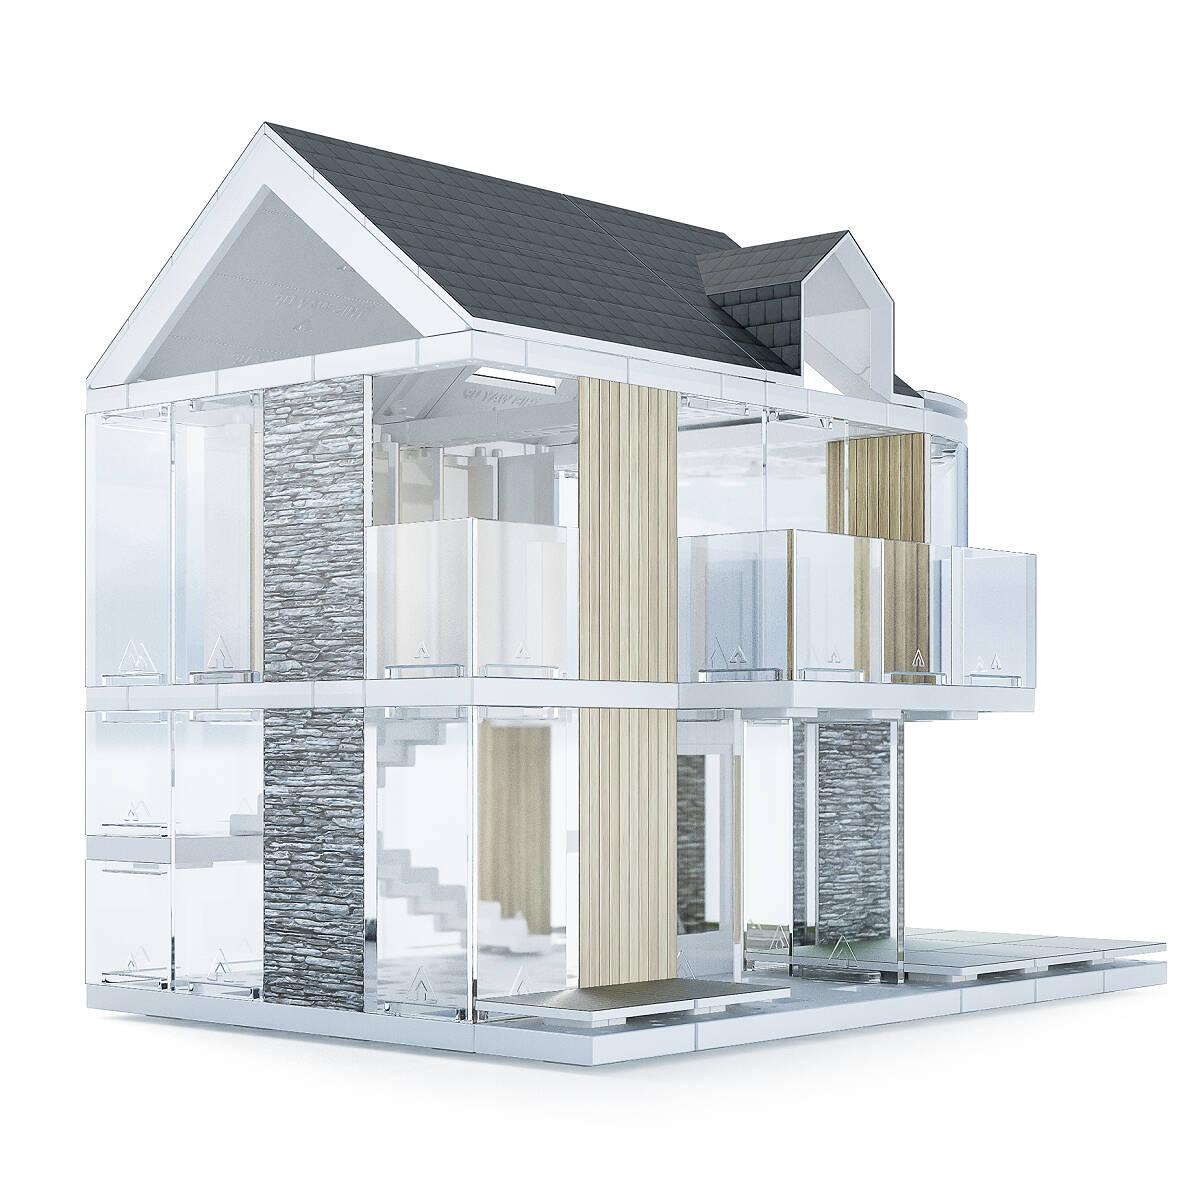 Architecture model house kits